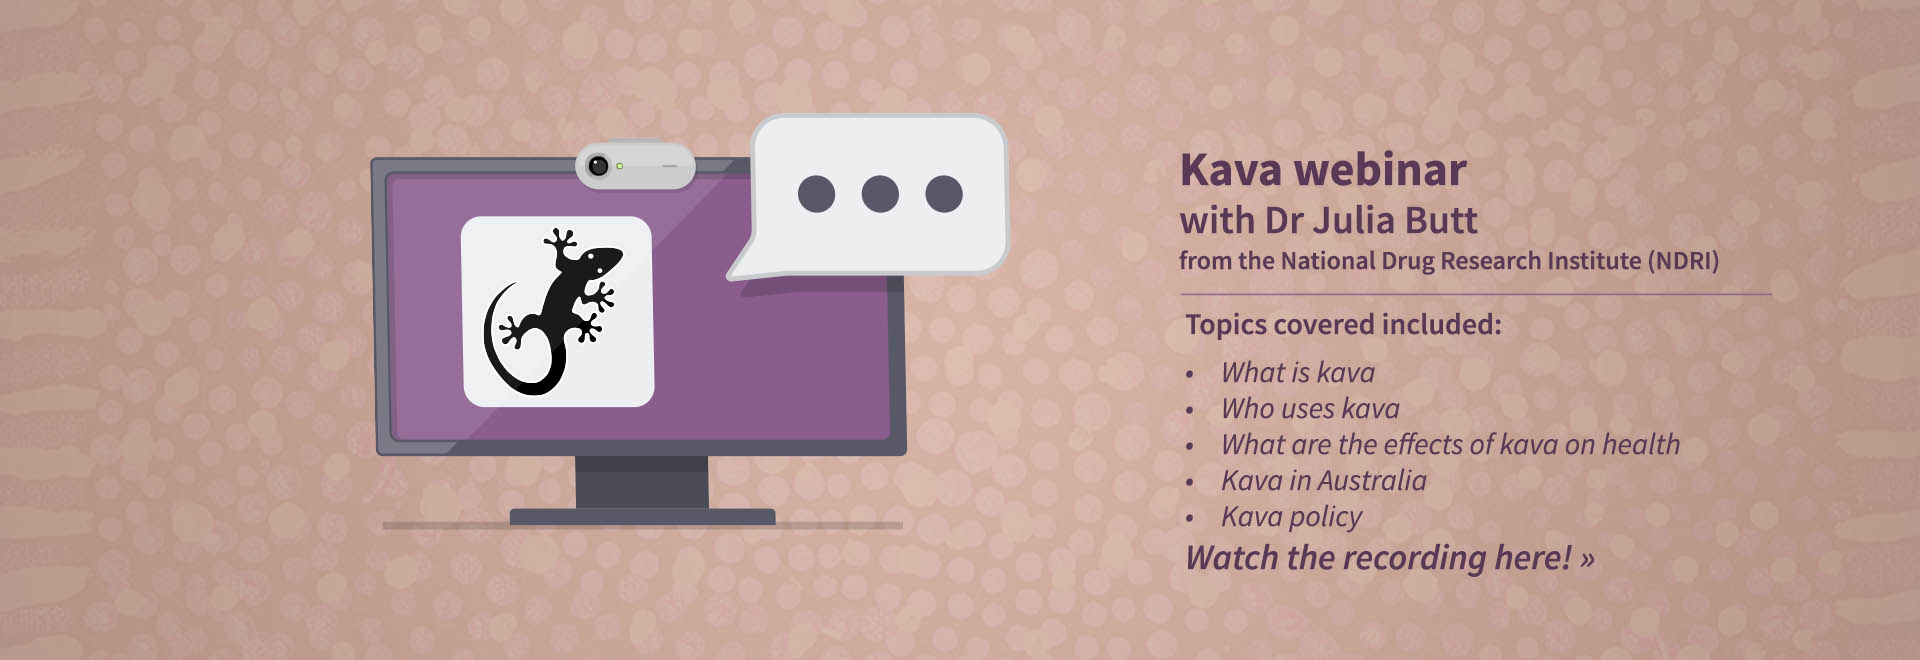 Kava Webinar